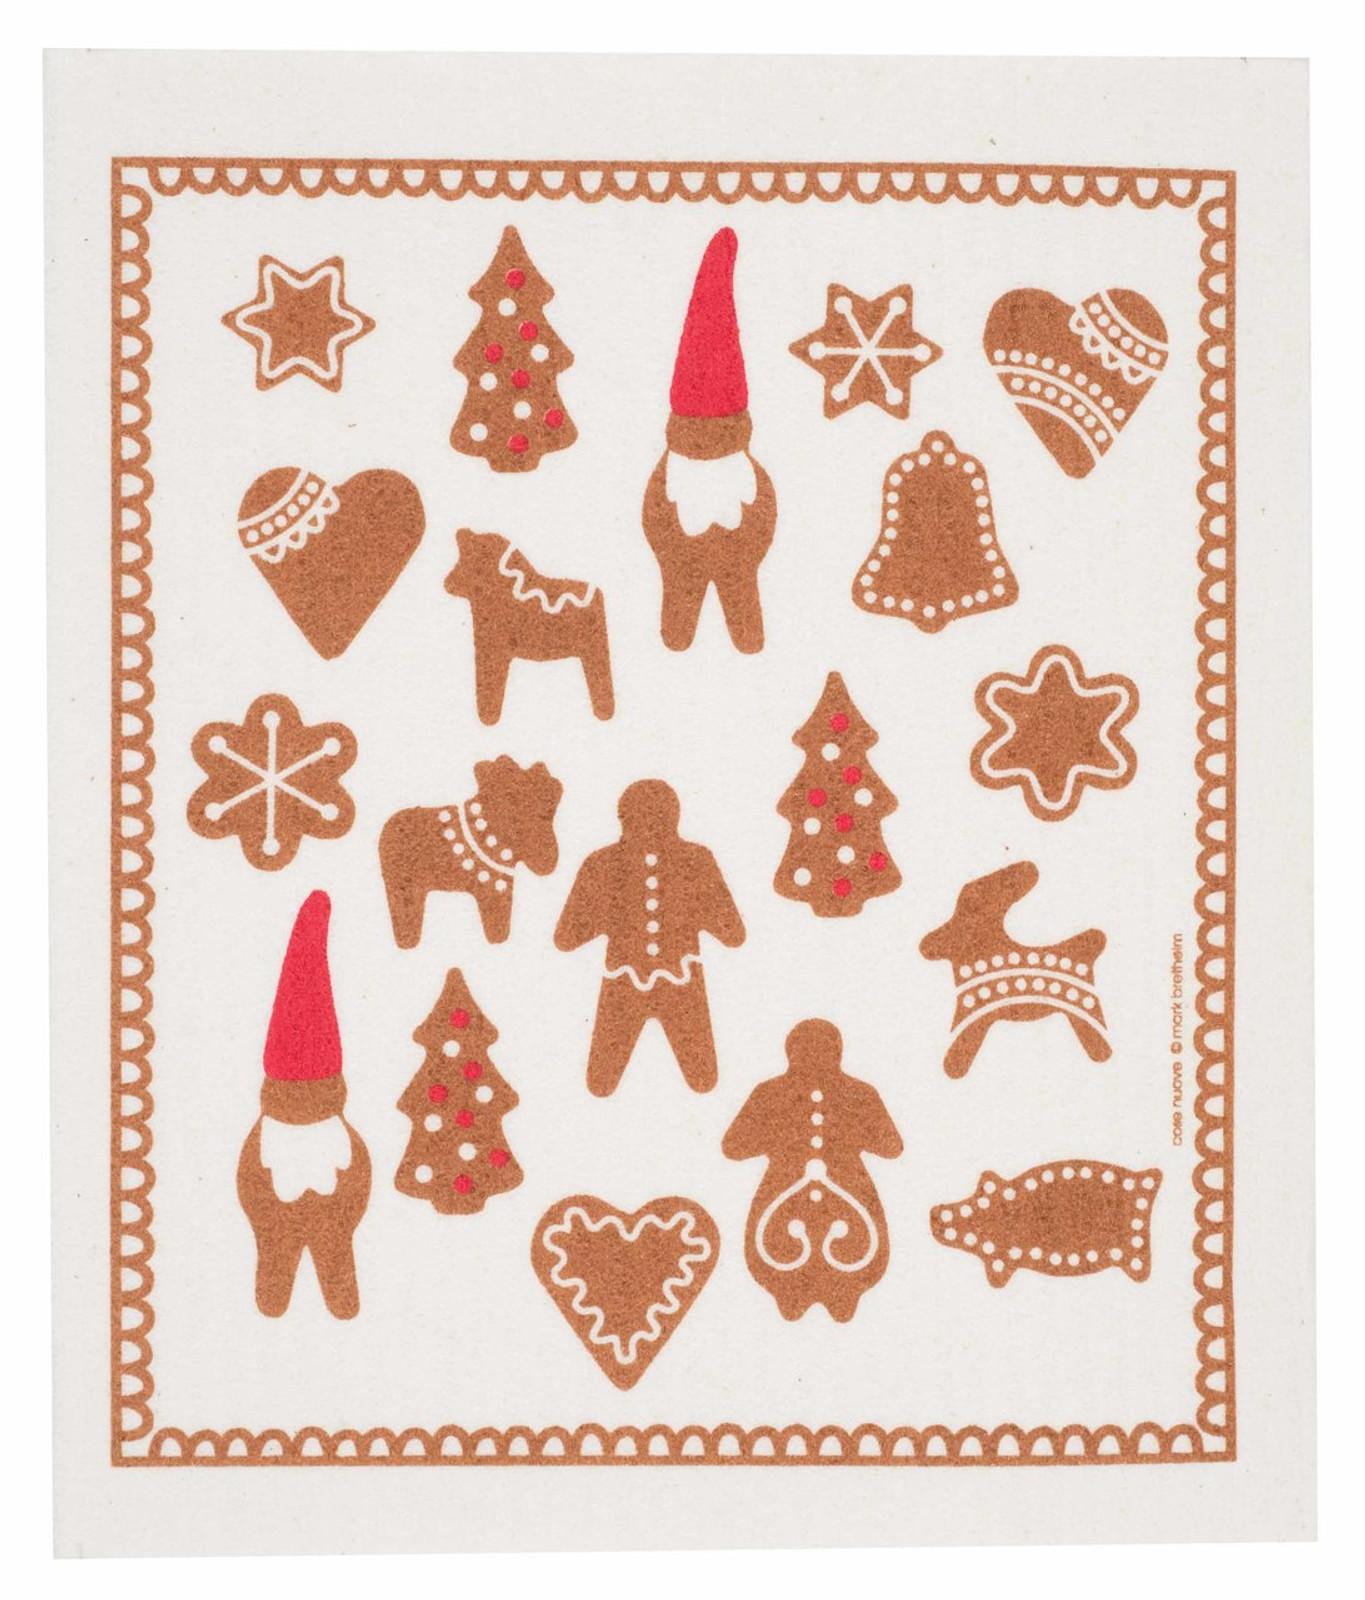 Swedish Christmas dish cloth, Gingerbread design